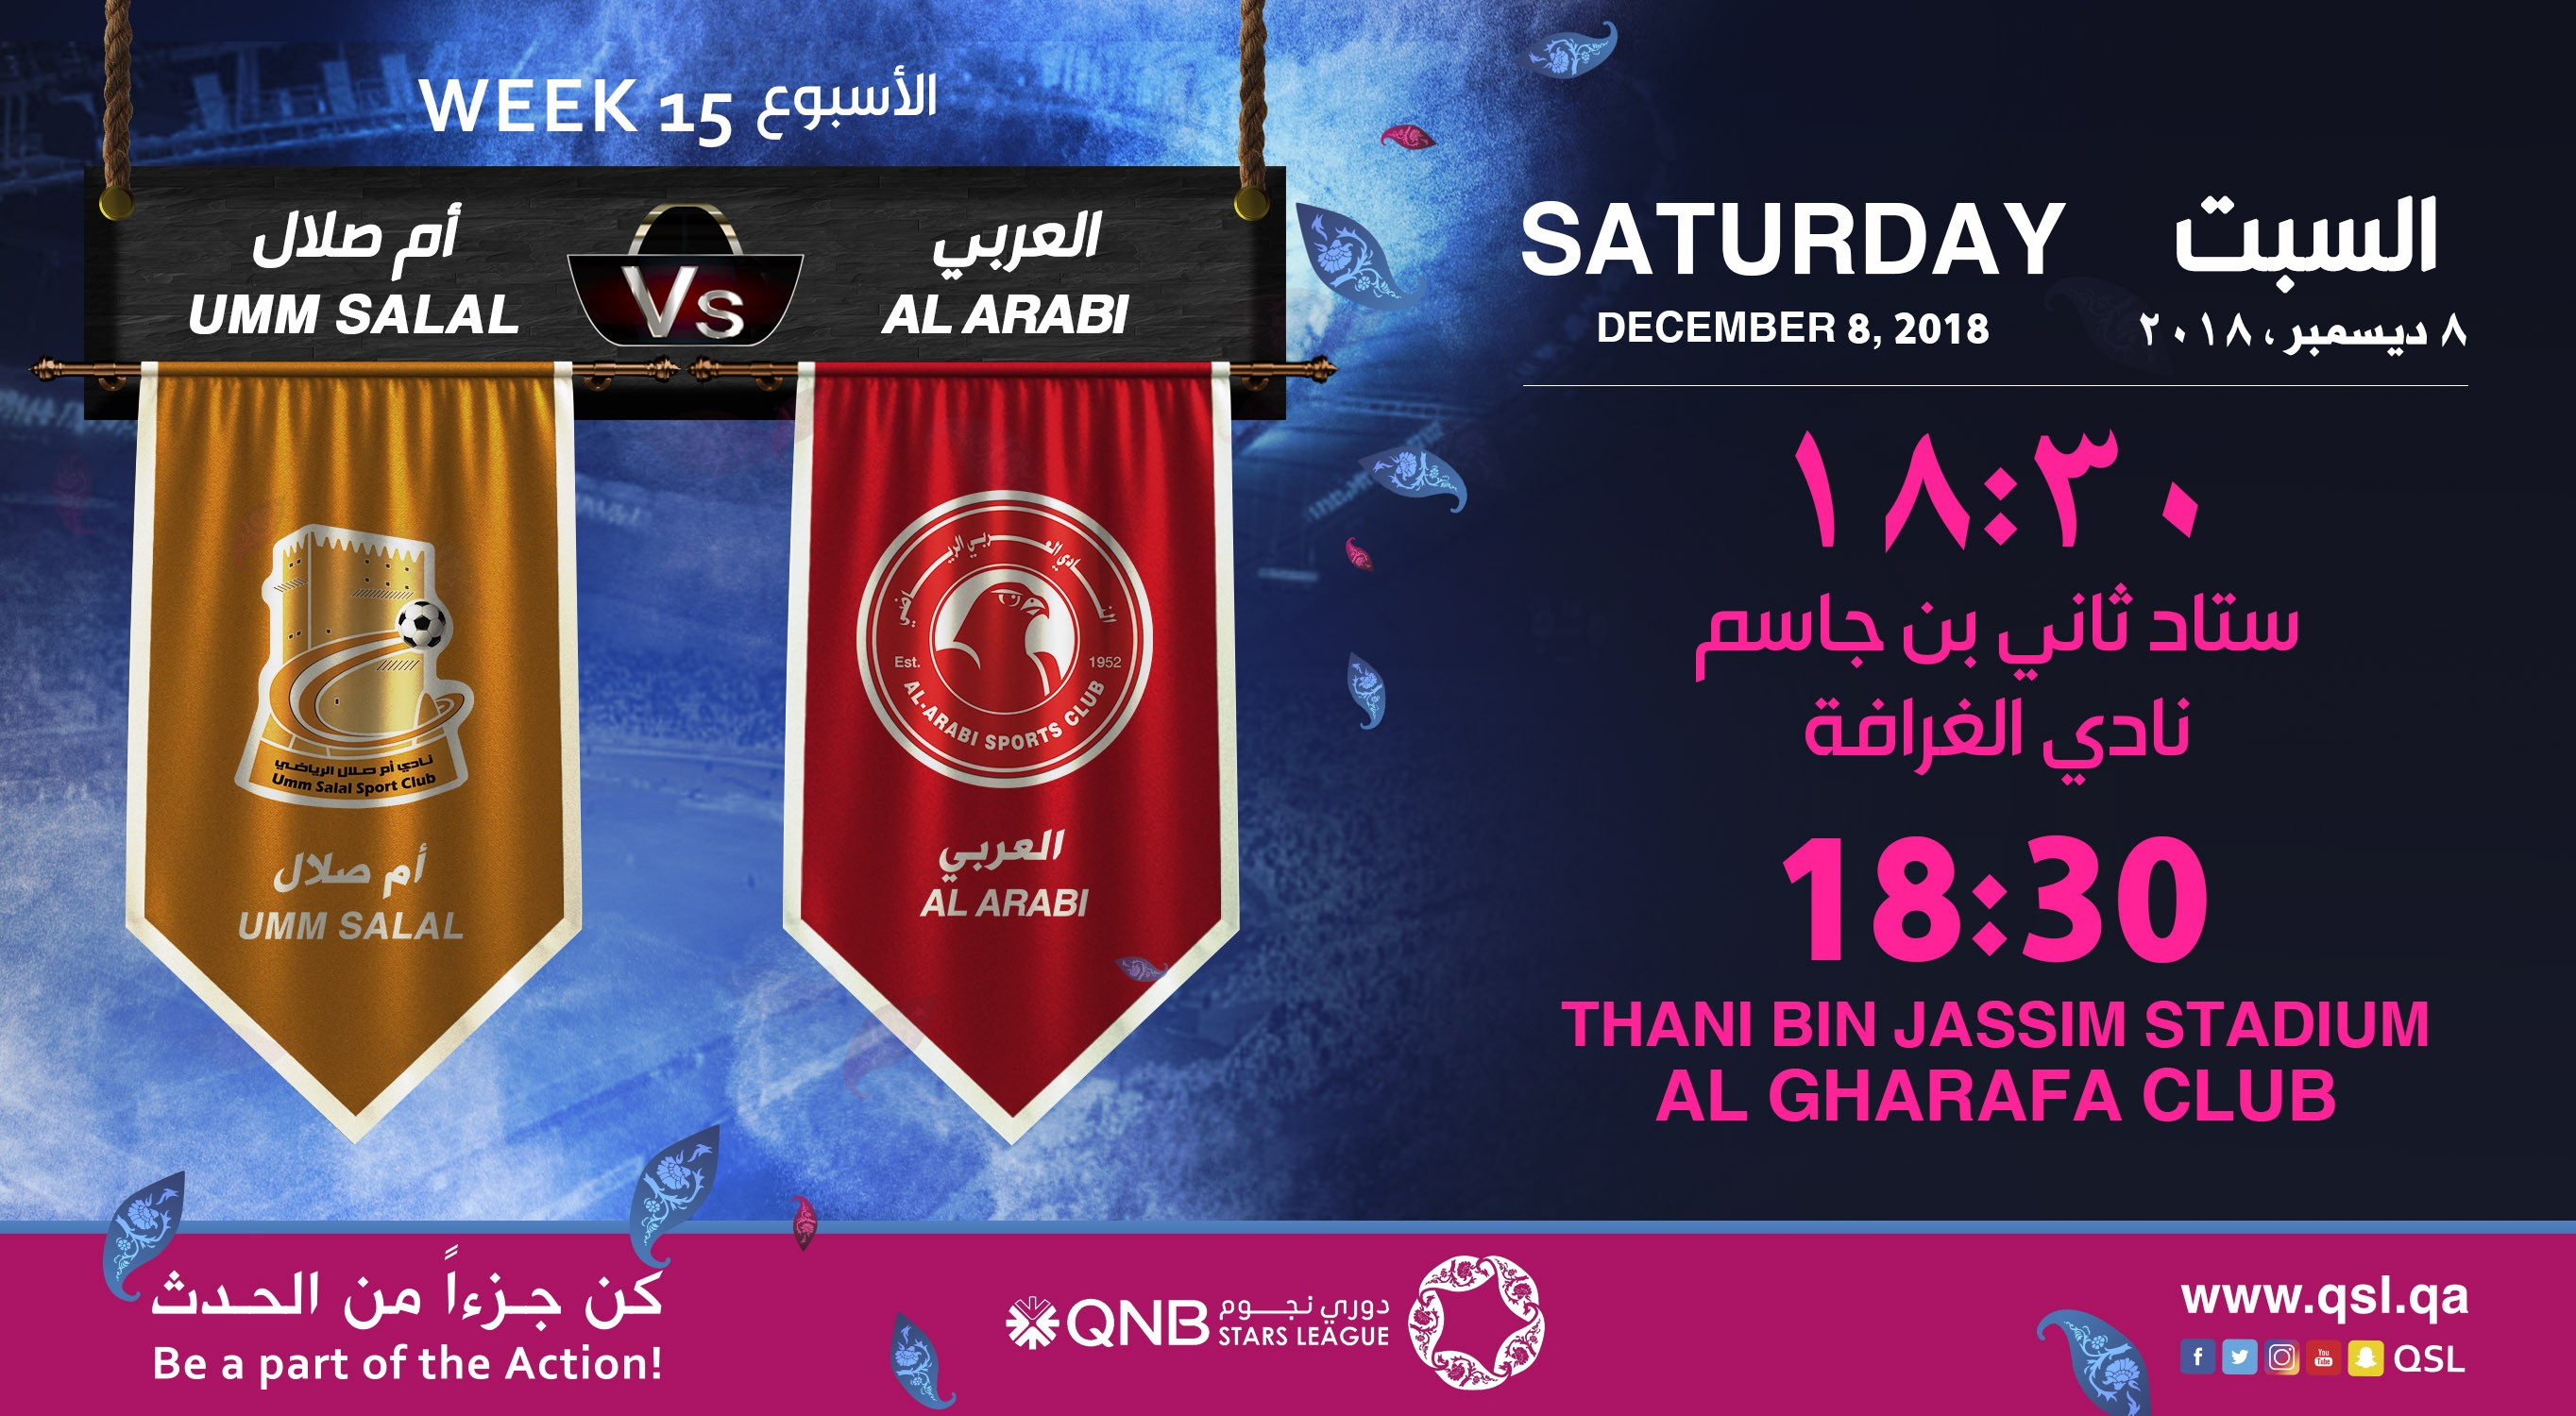 QNB Stars League Week 15 — Umm Salal vs Al Arabi